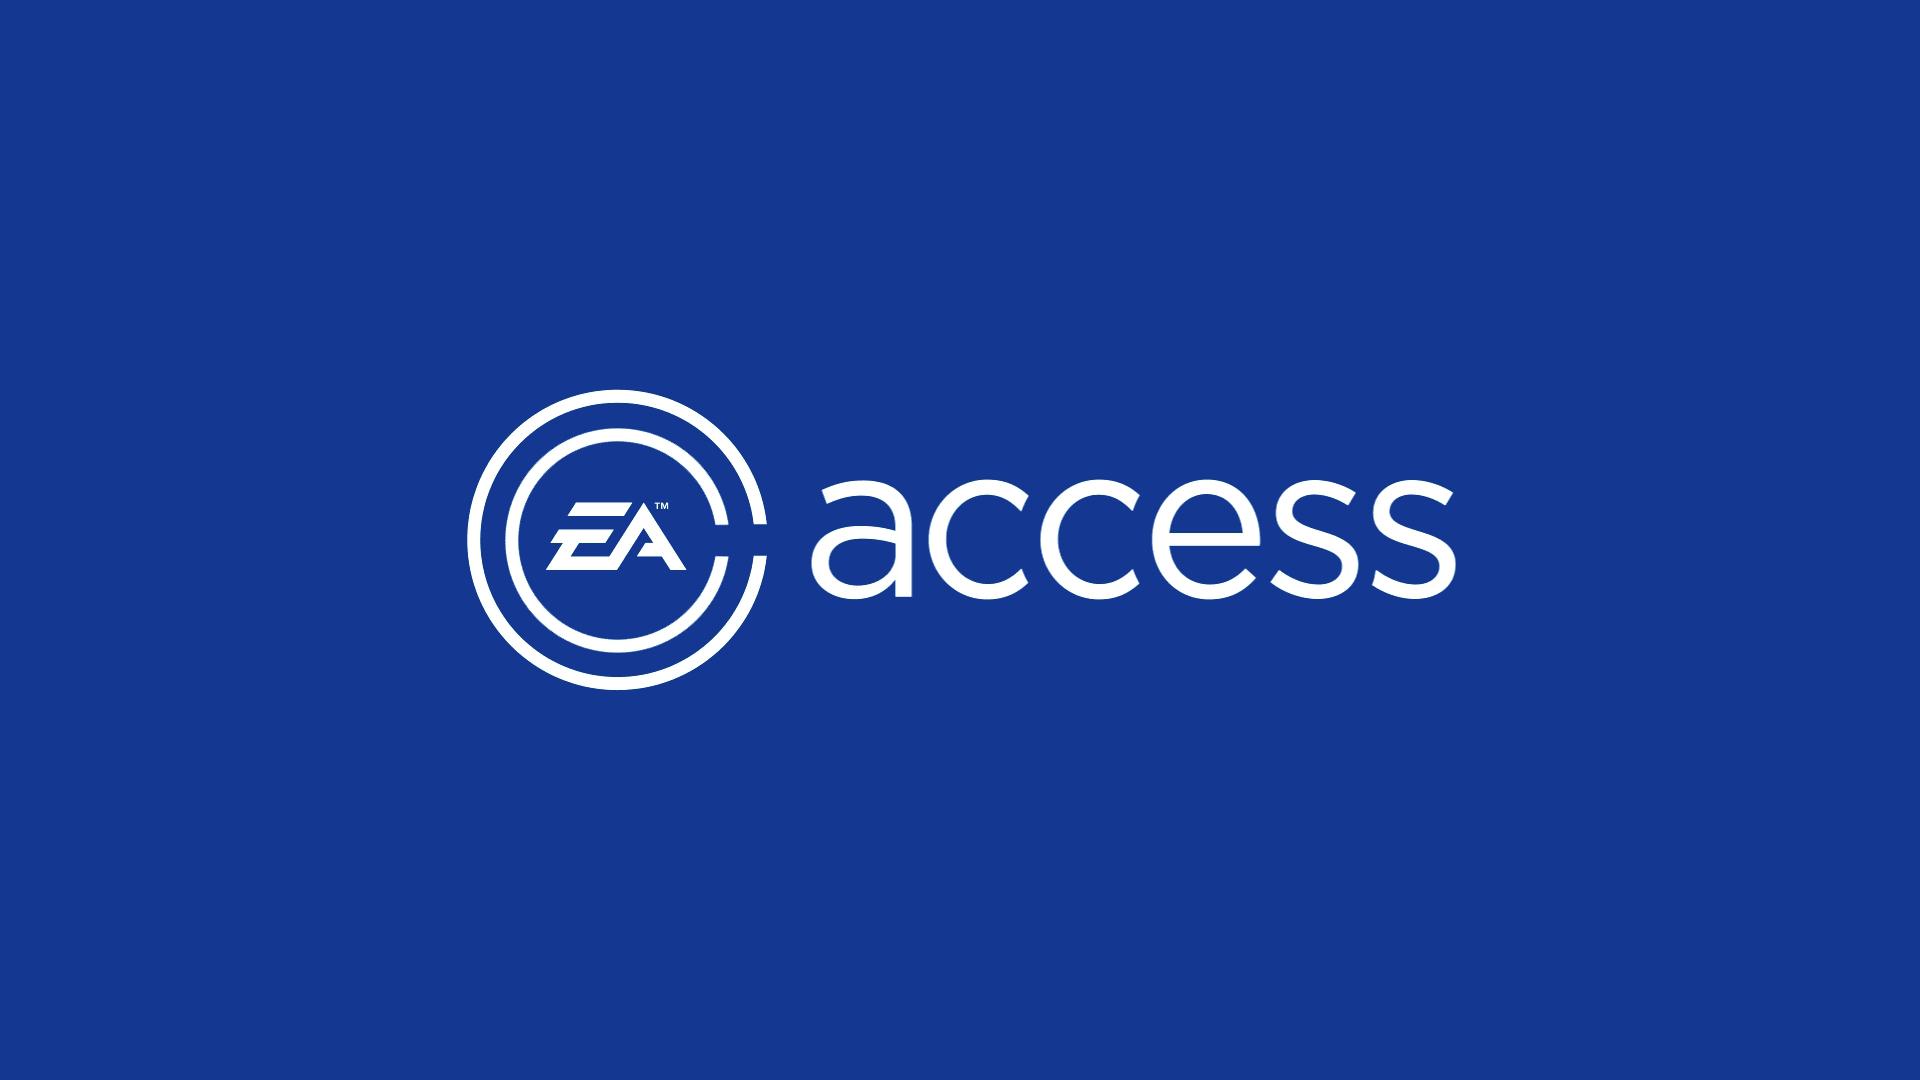 EA Access برای پلیاستیشن ۴